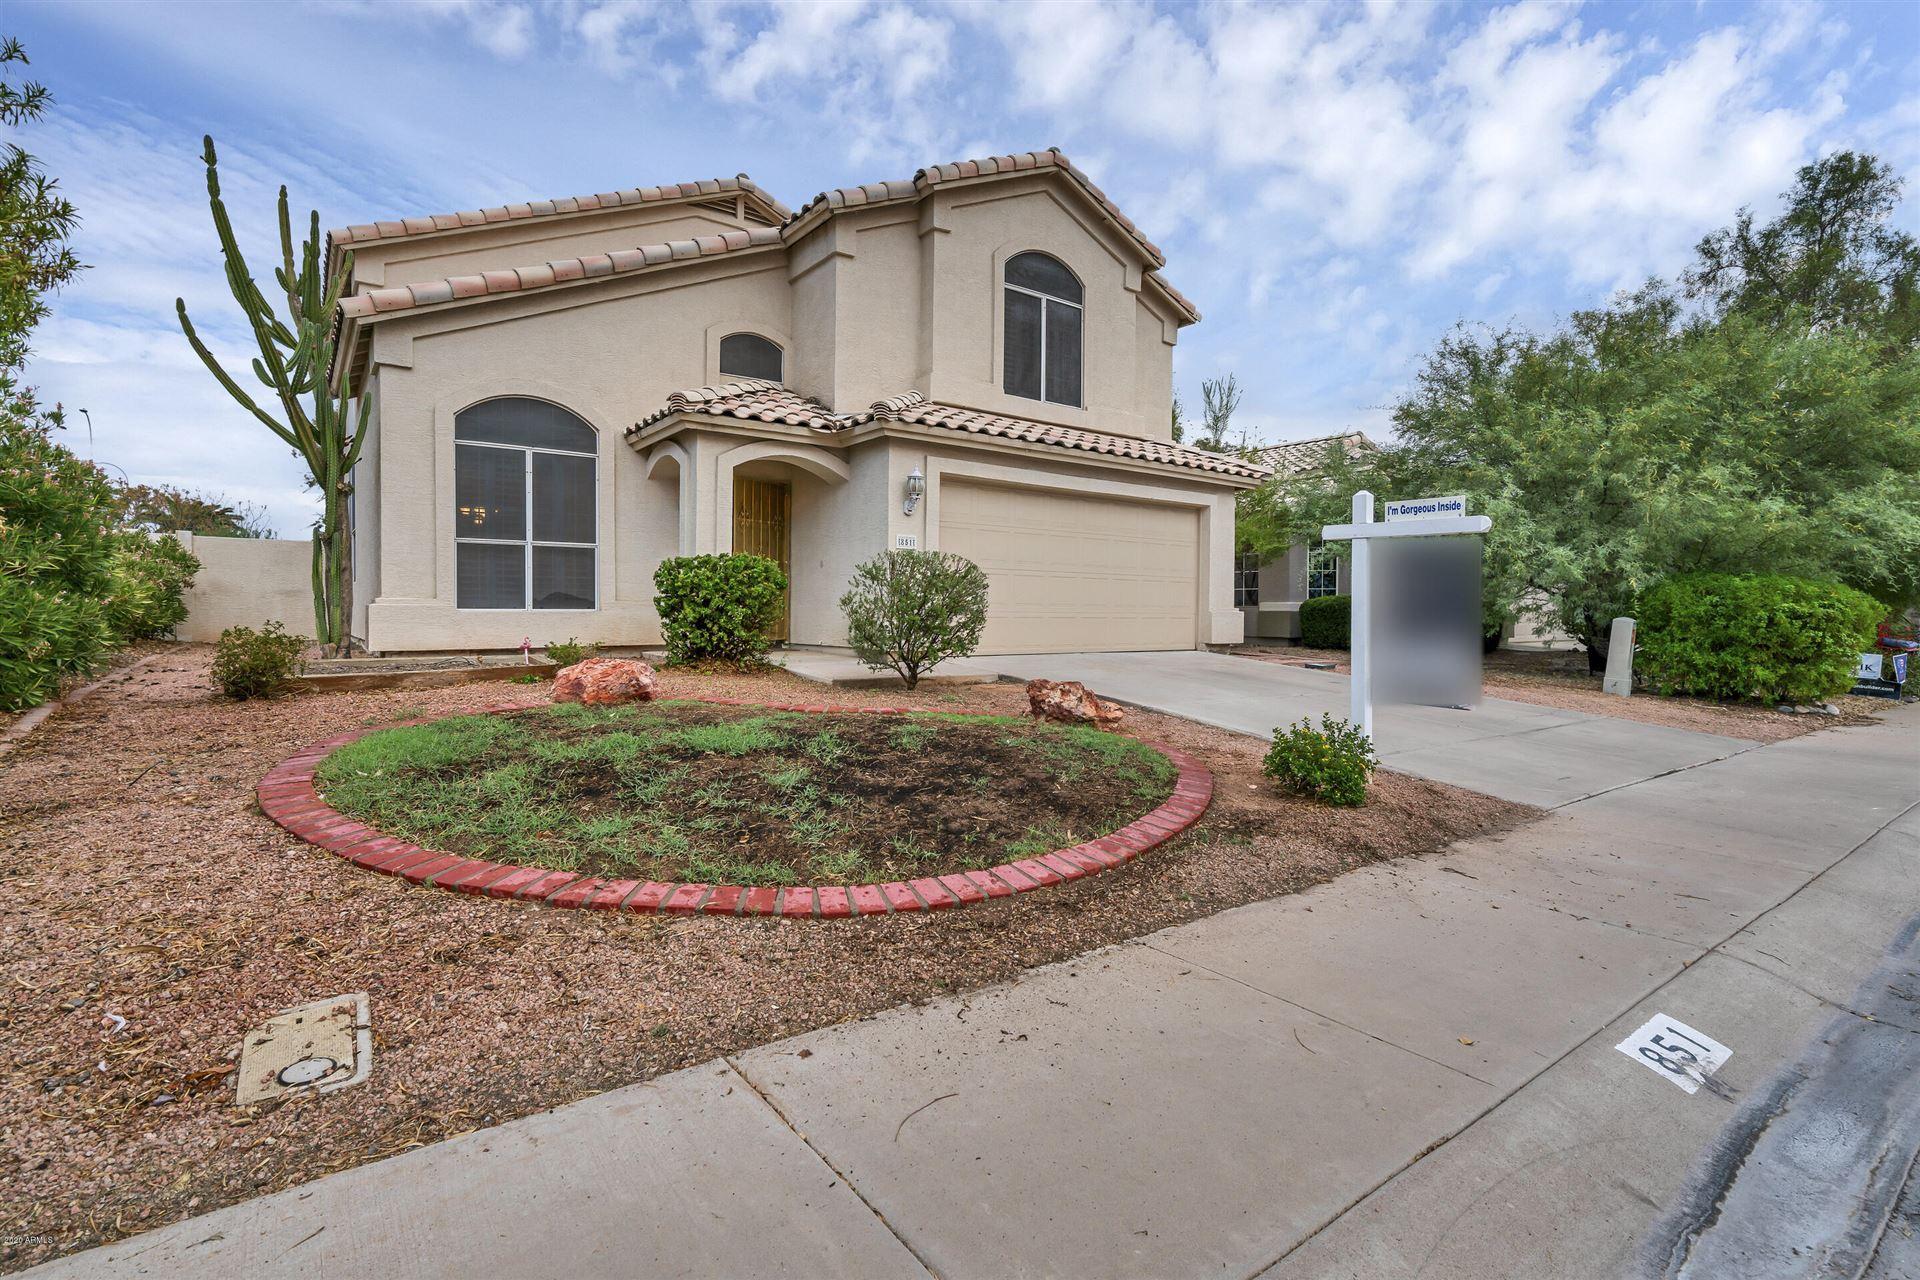 851 N LONGMORE Street, Chandler, AZ 85224 - MLS#: 6105982